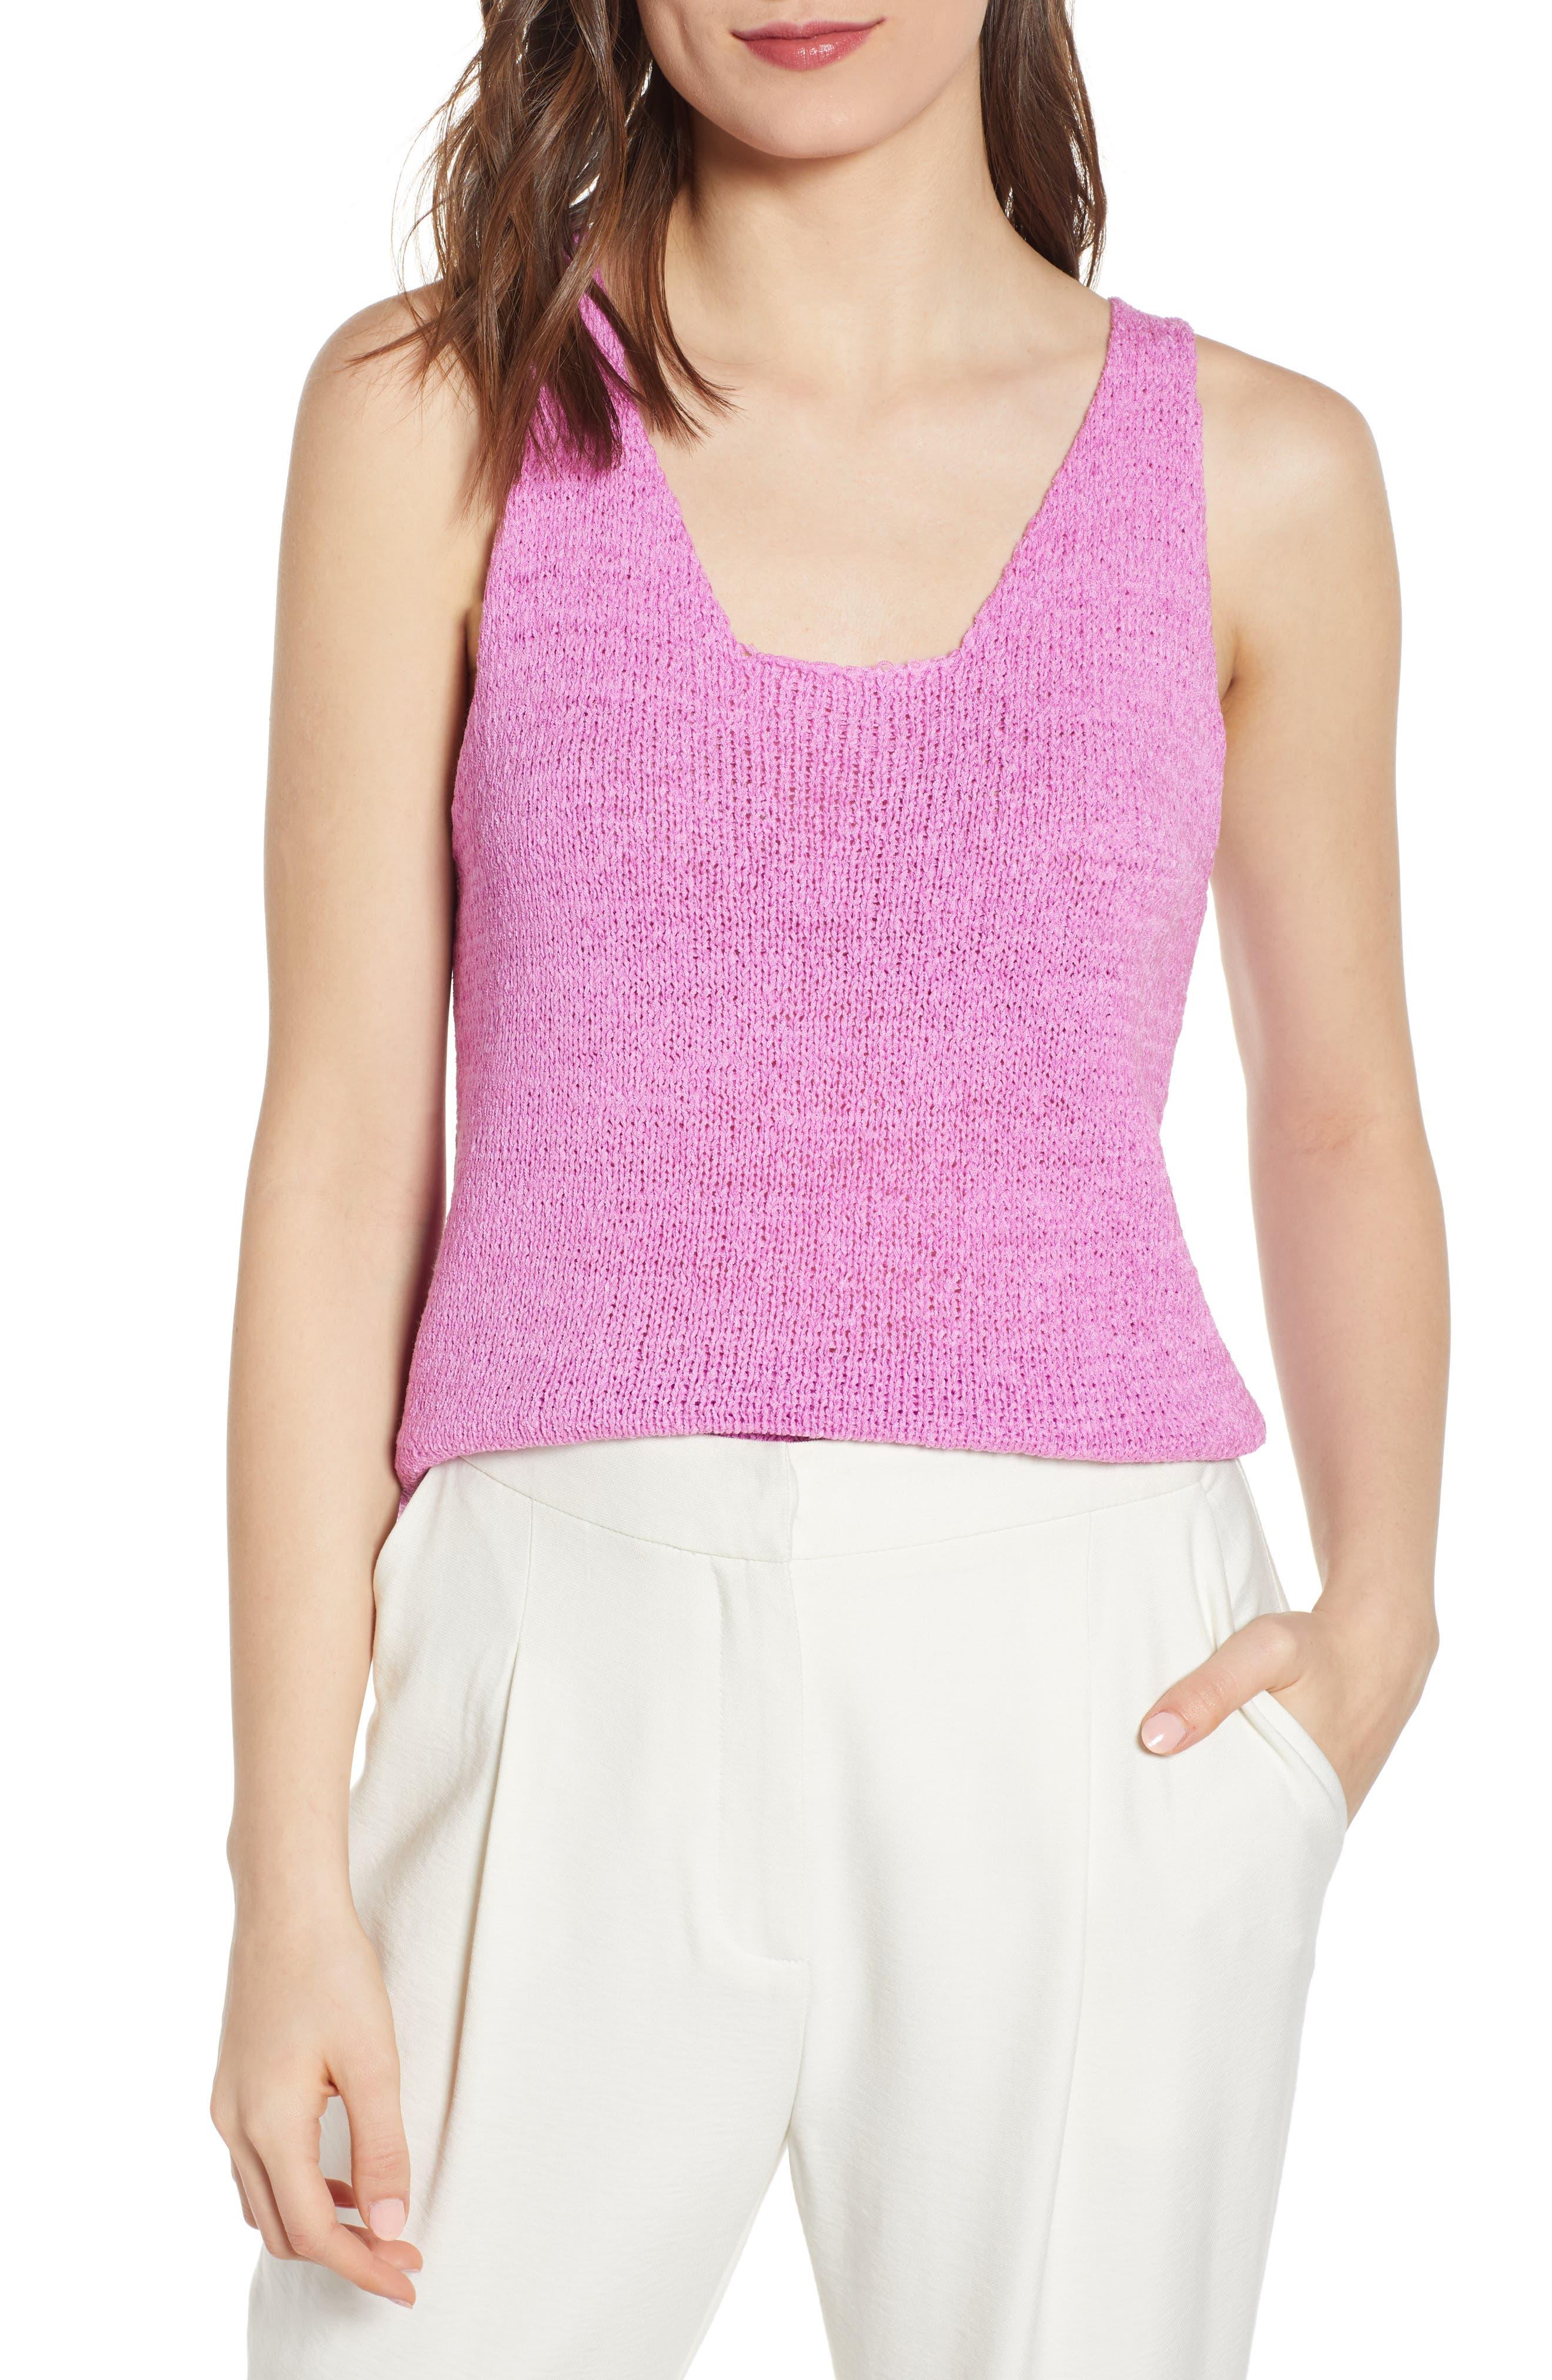 J.o.a. Knit Camisole, Pink